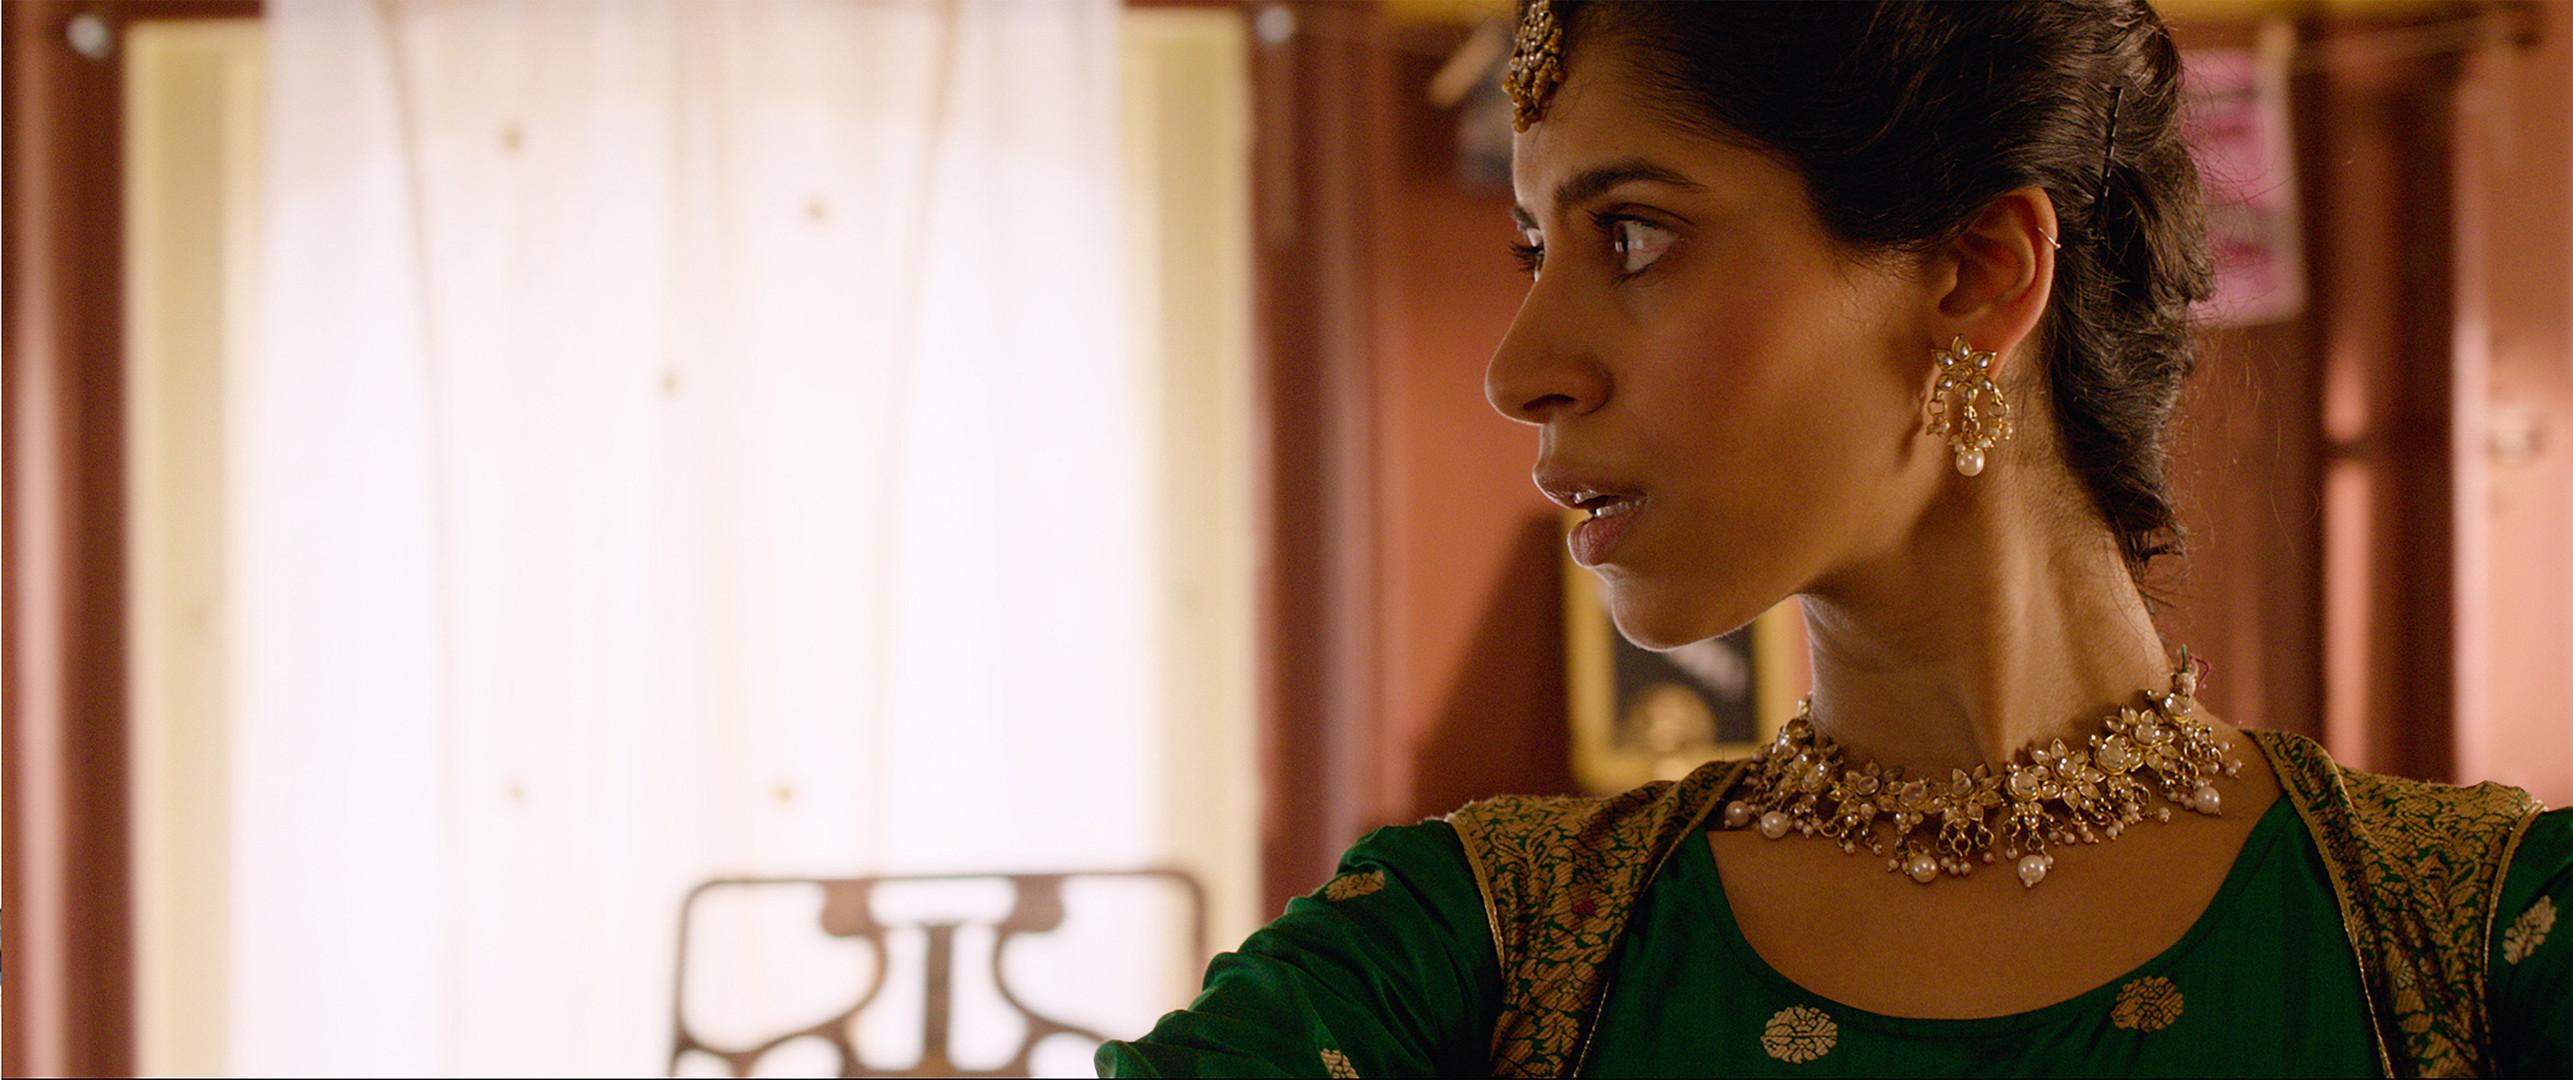 Nikita Tewani as Dua. Enlightenment awaits.